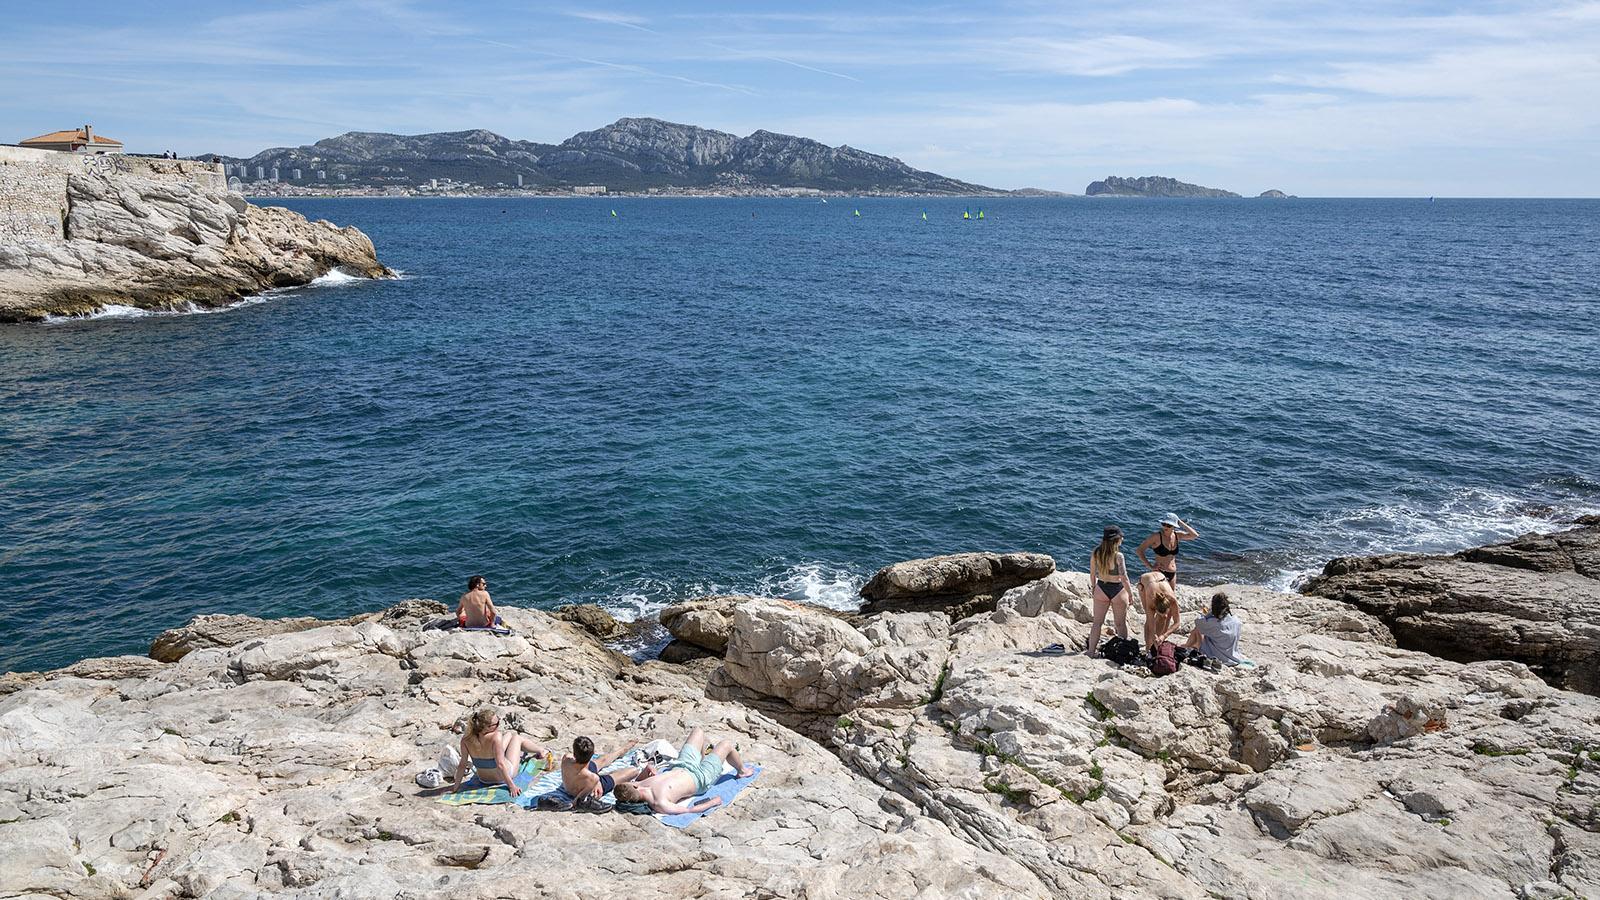 Corniche Président J. F. Kennedy, Marseille. Foto: Hilke Maunder